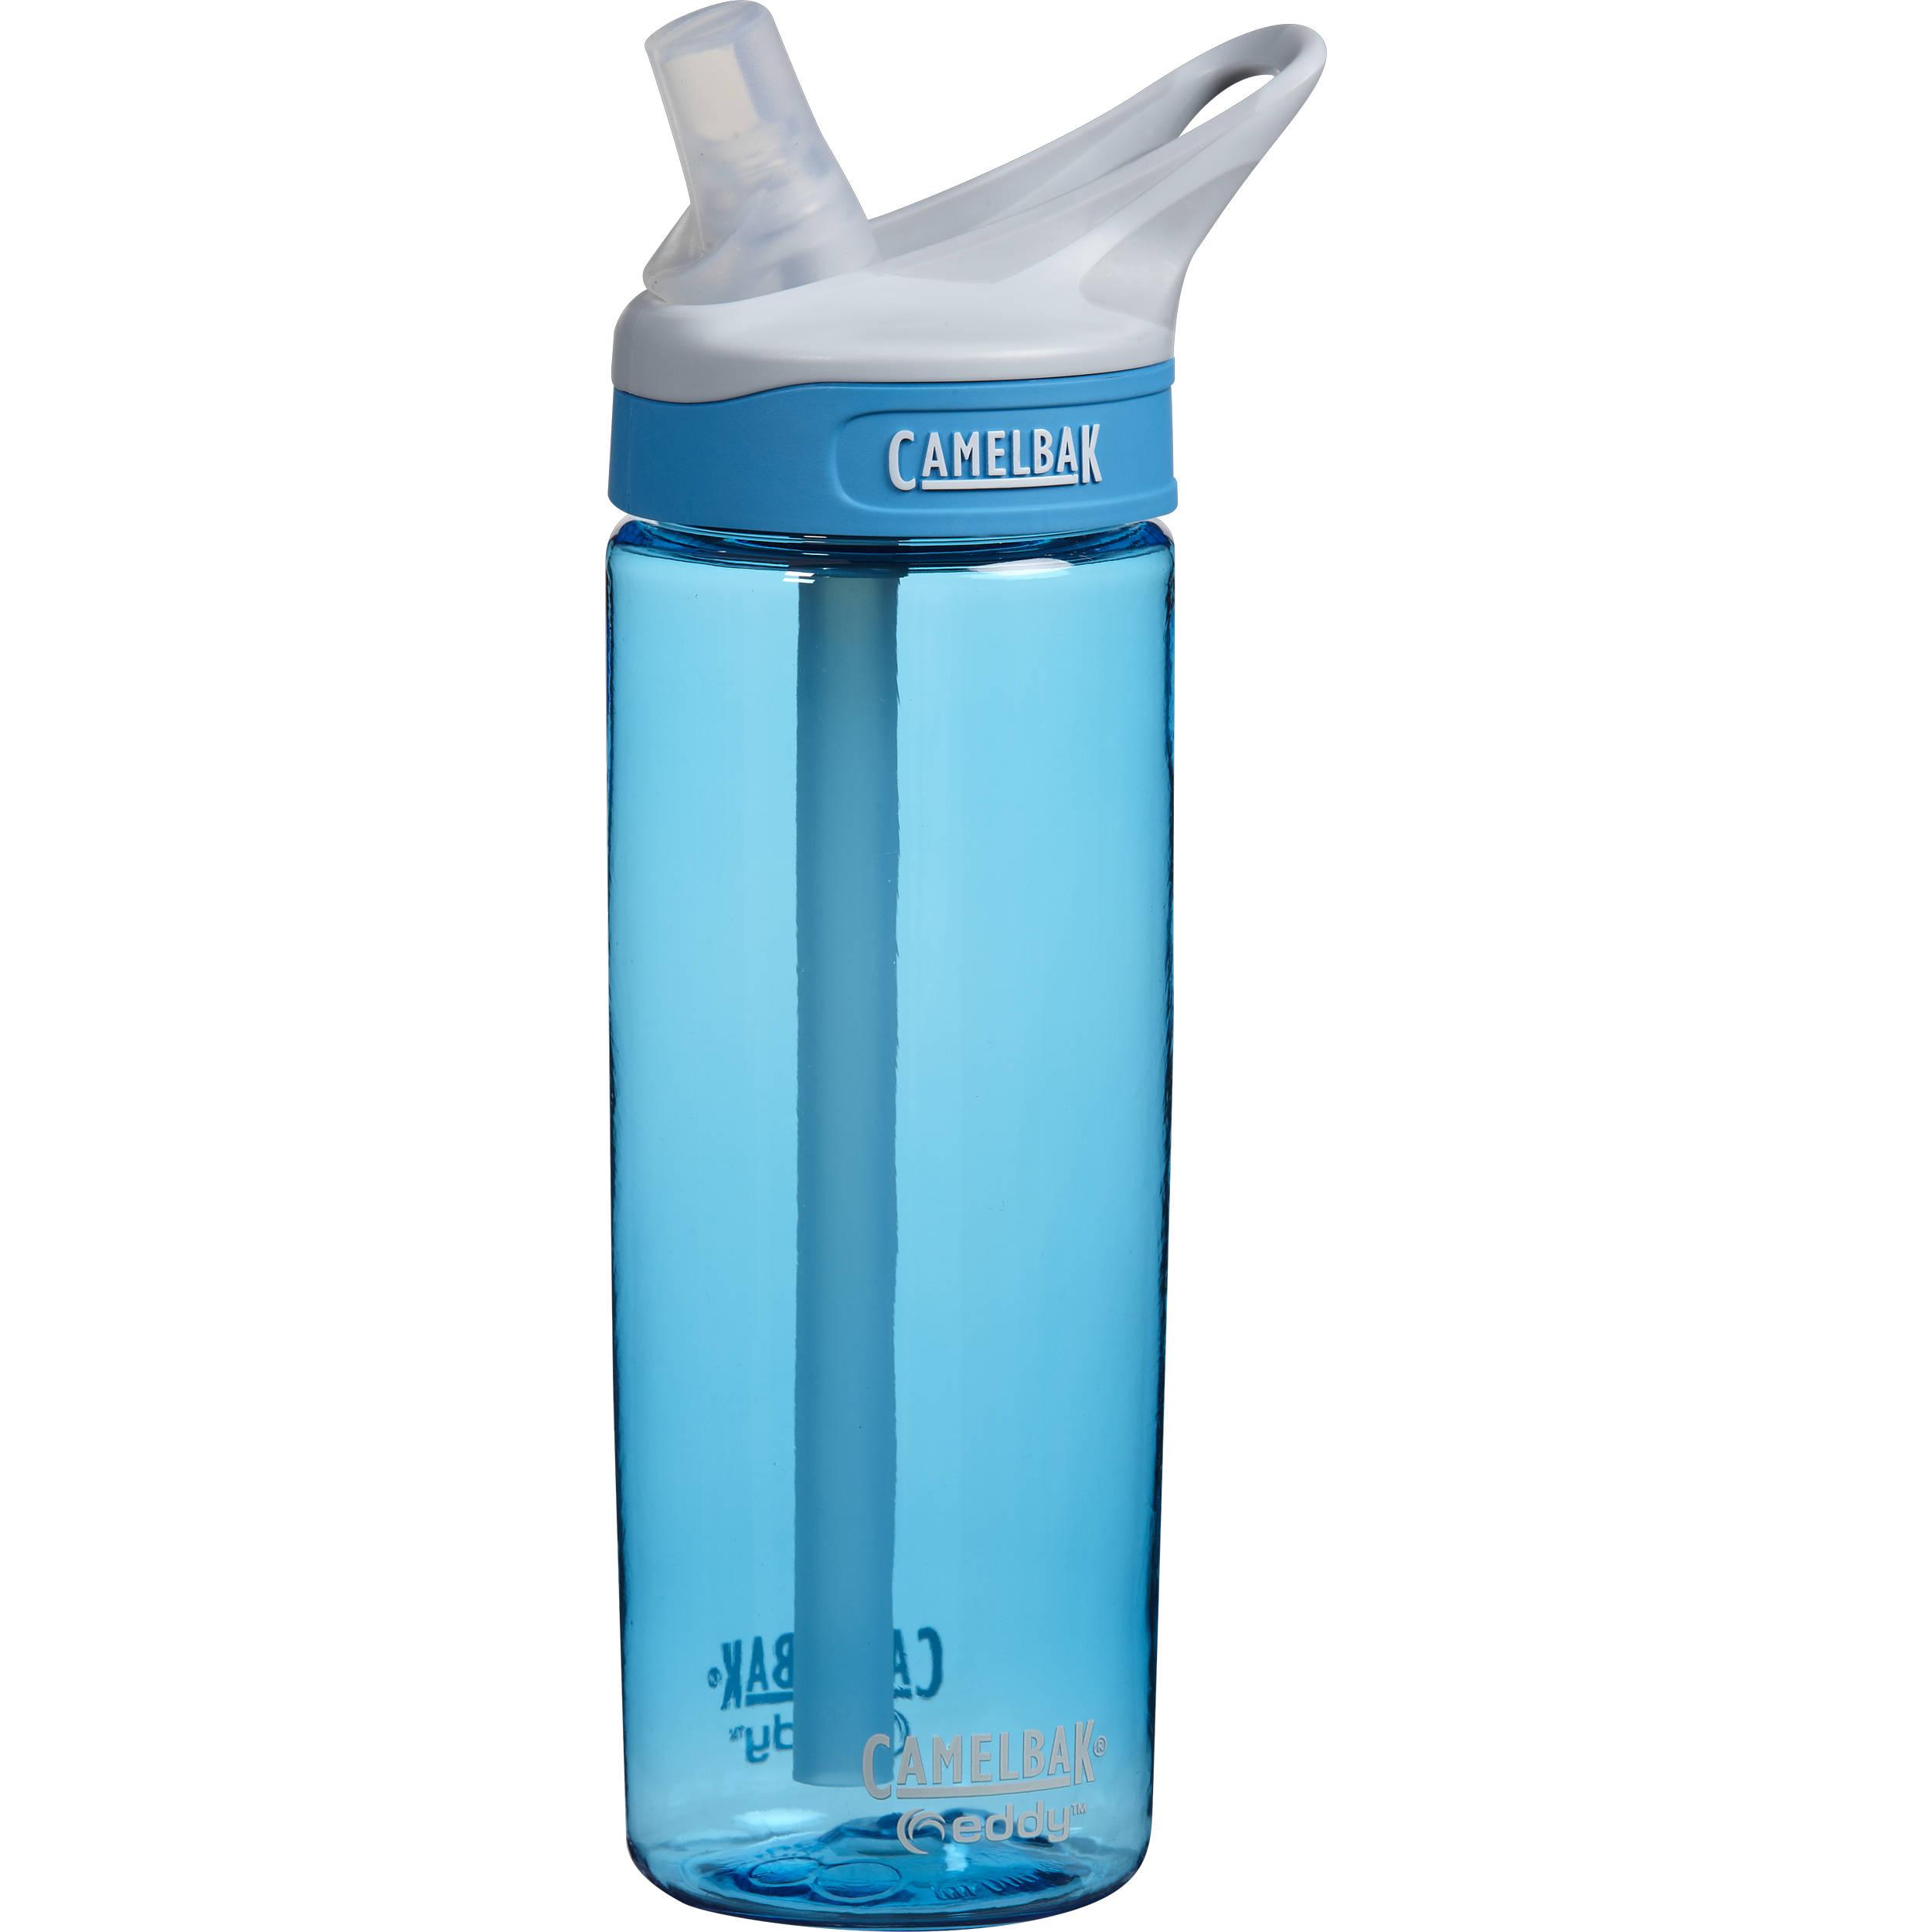 CAMELBAK eddy Water Bottle (20 fl oz, Rain) 53635 B&H Photo